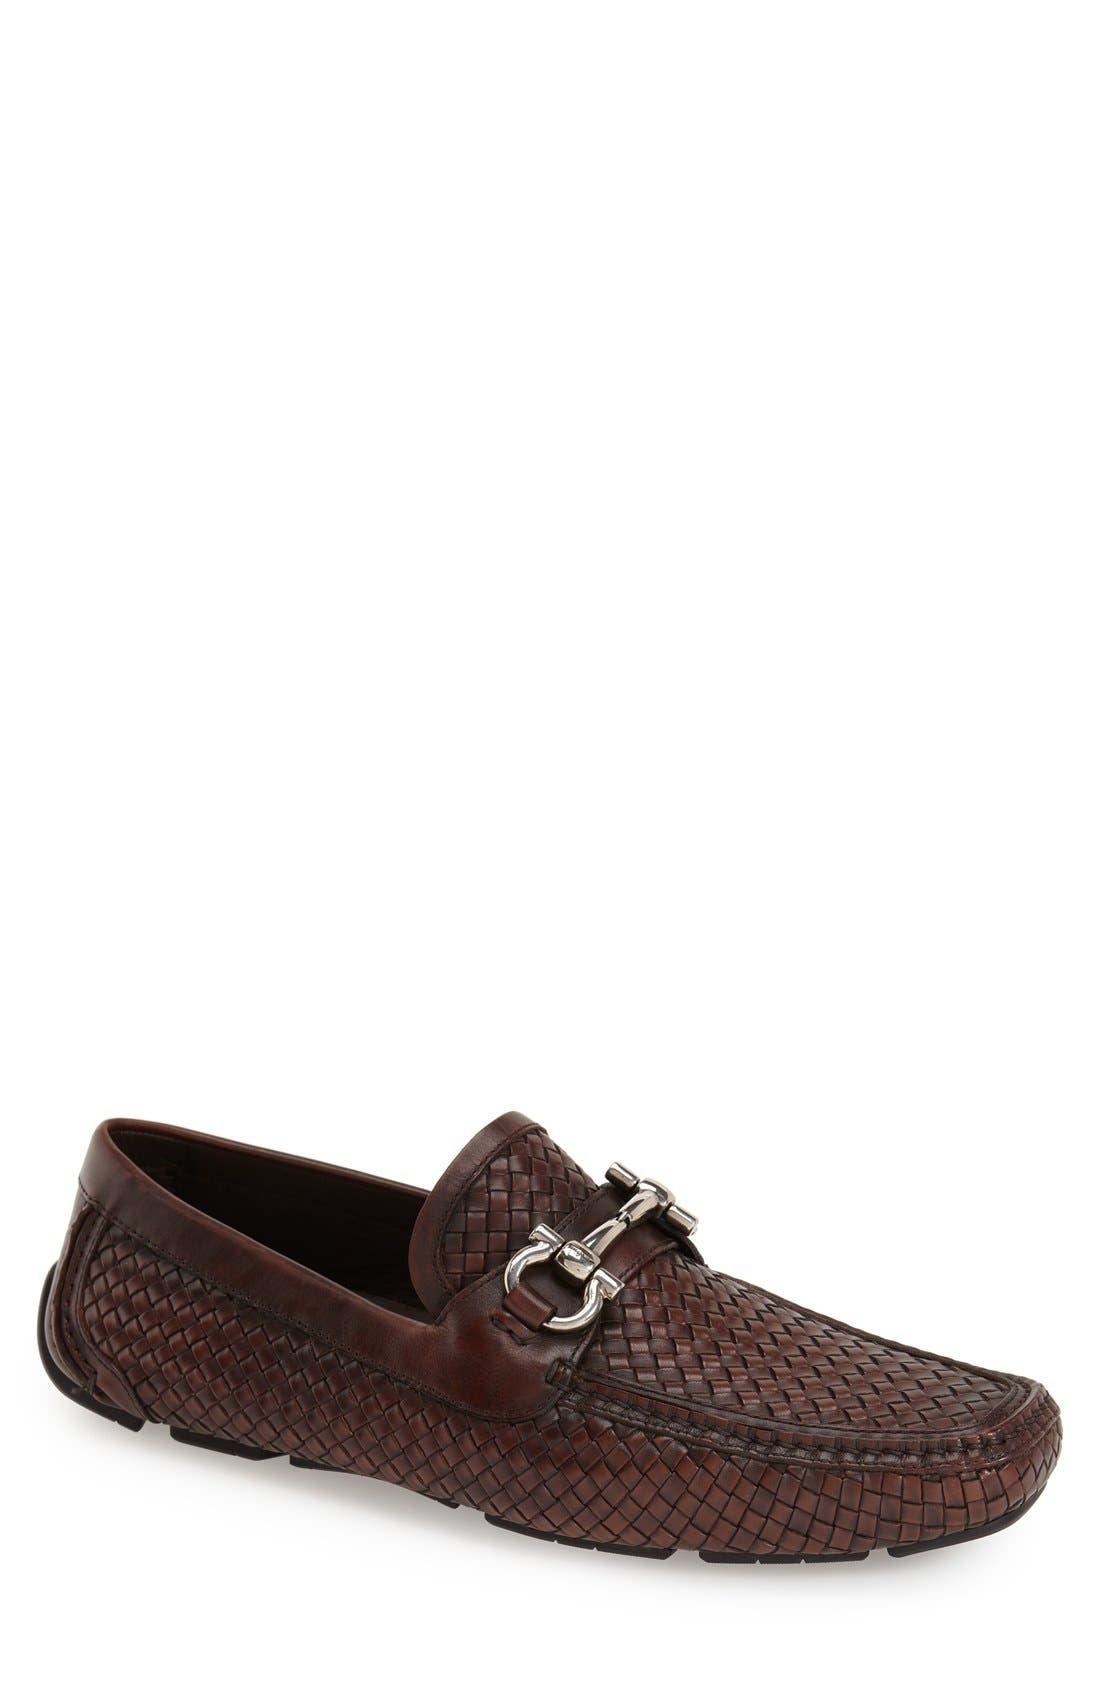 'Parigi' Woven Bit Loafer,                         Main,                         color, Brown Hen/ T Moro Leather